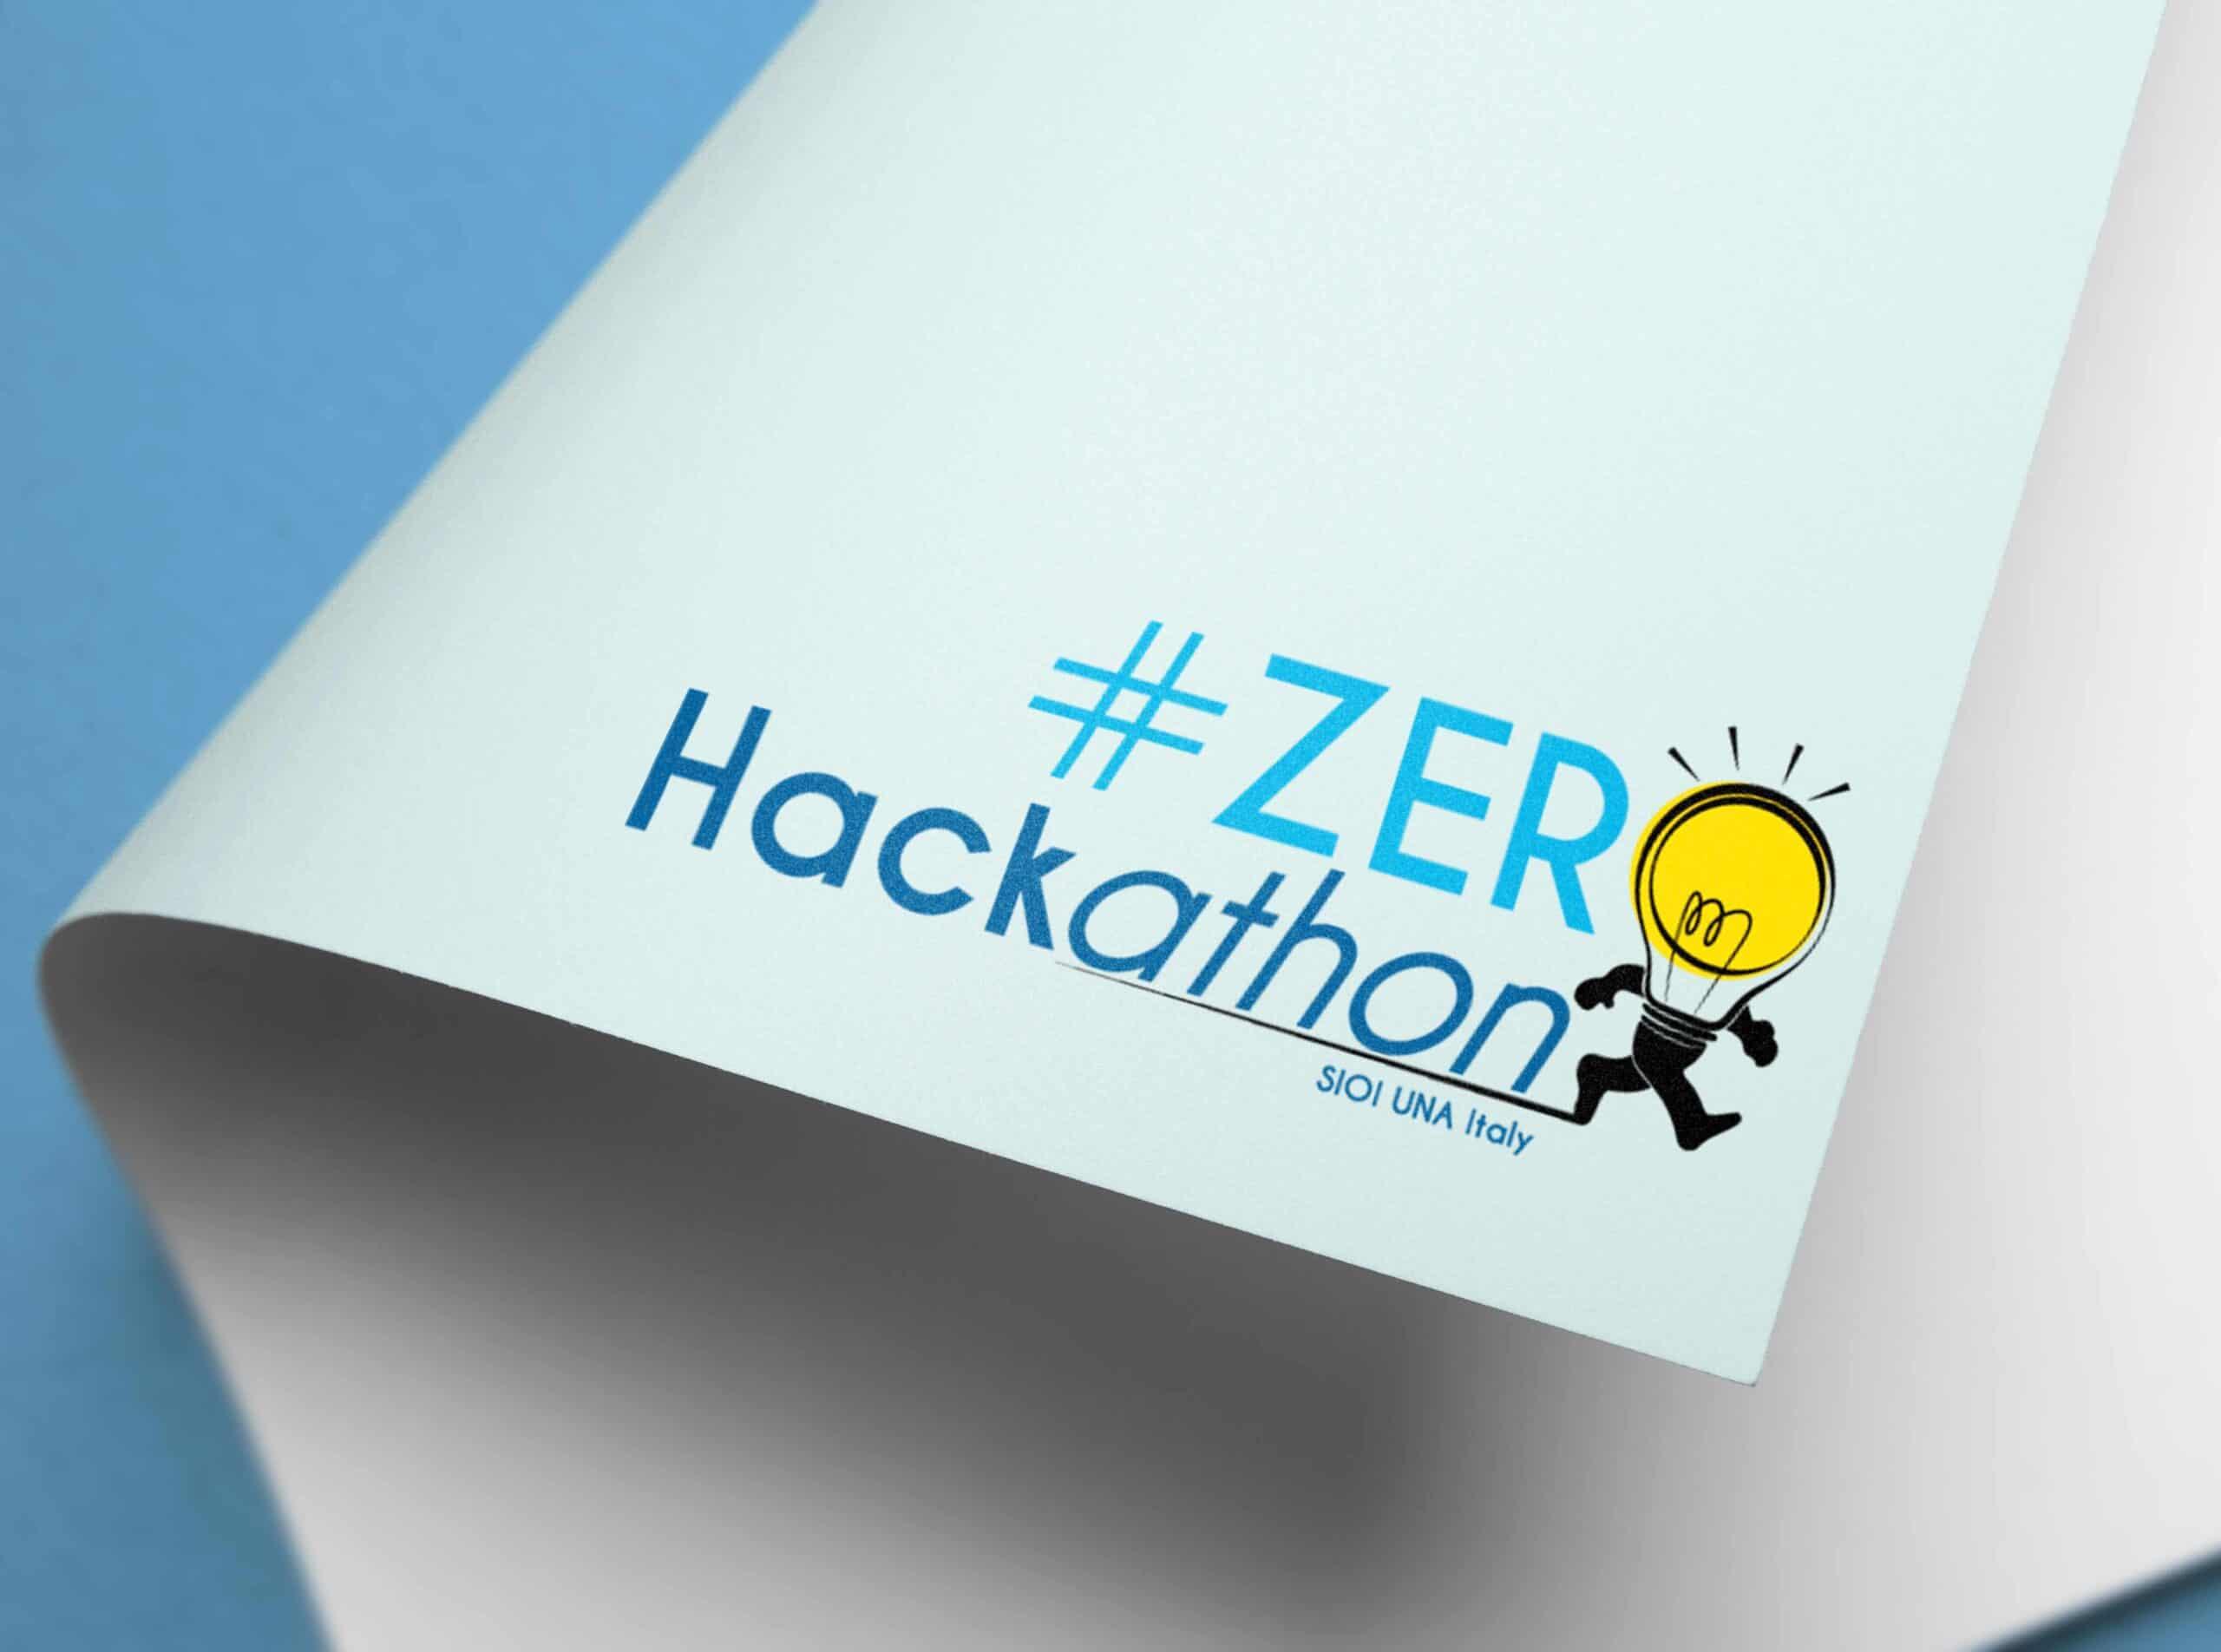 Logo design for the event Zerohackathon